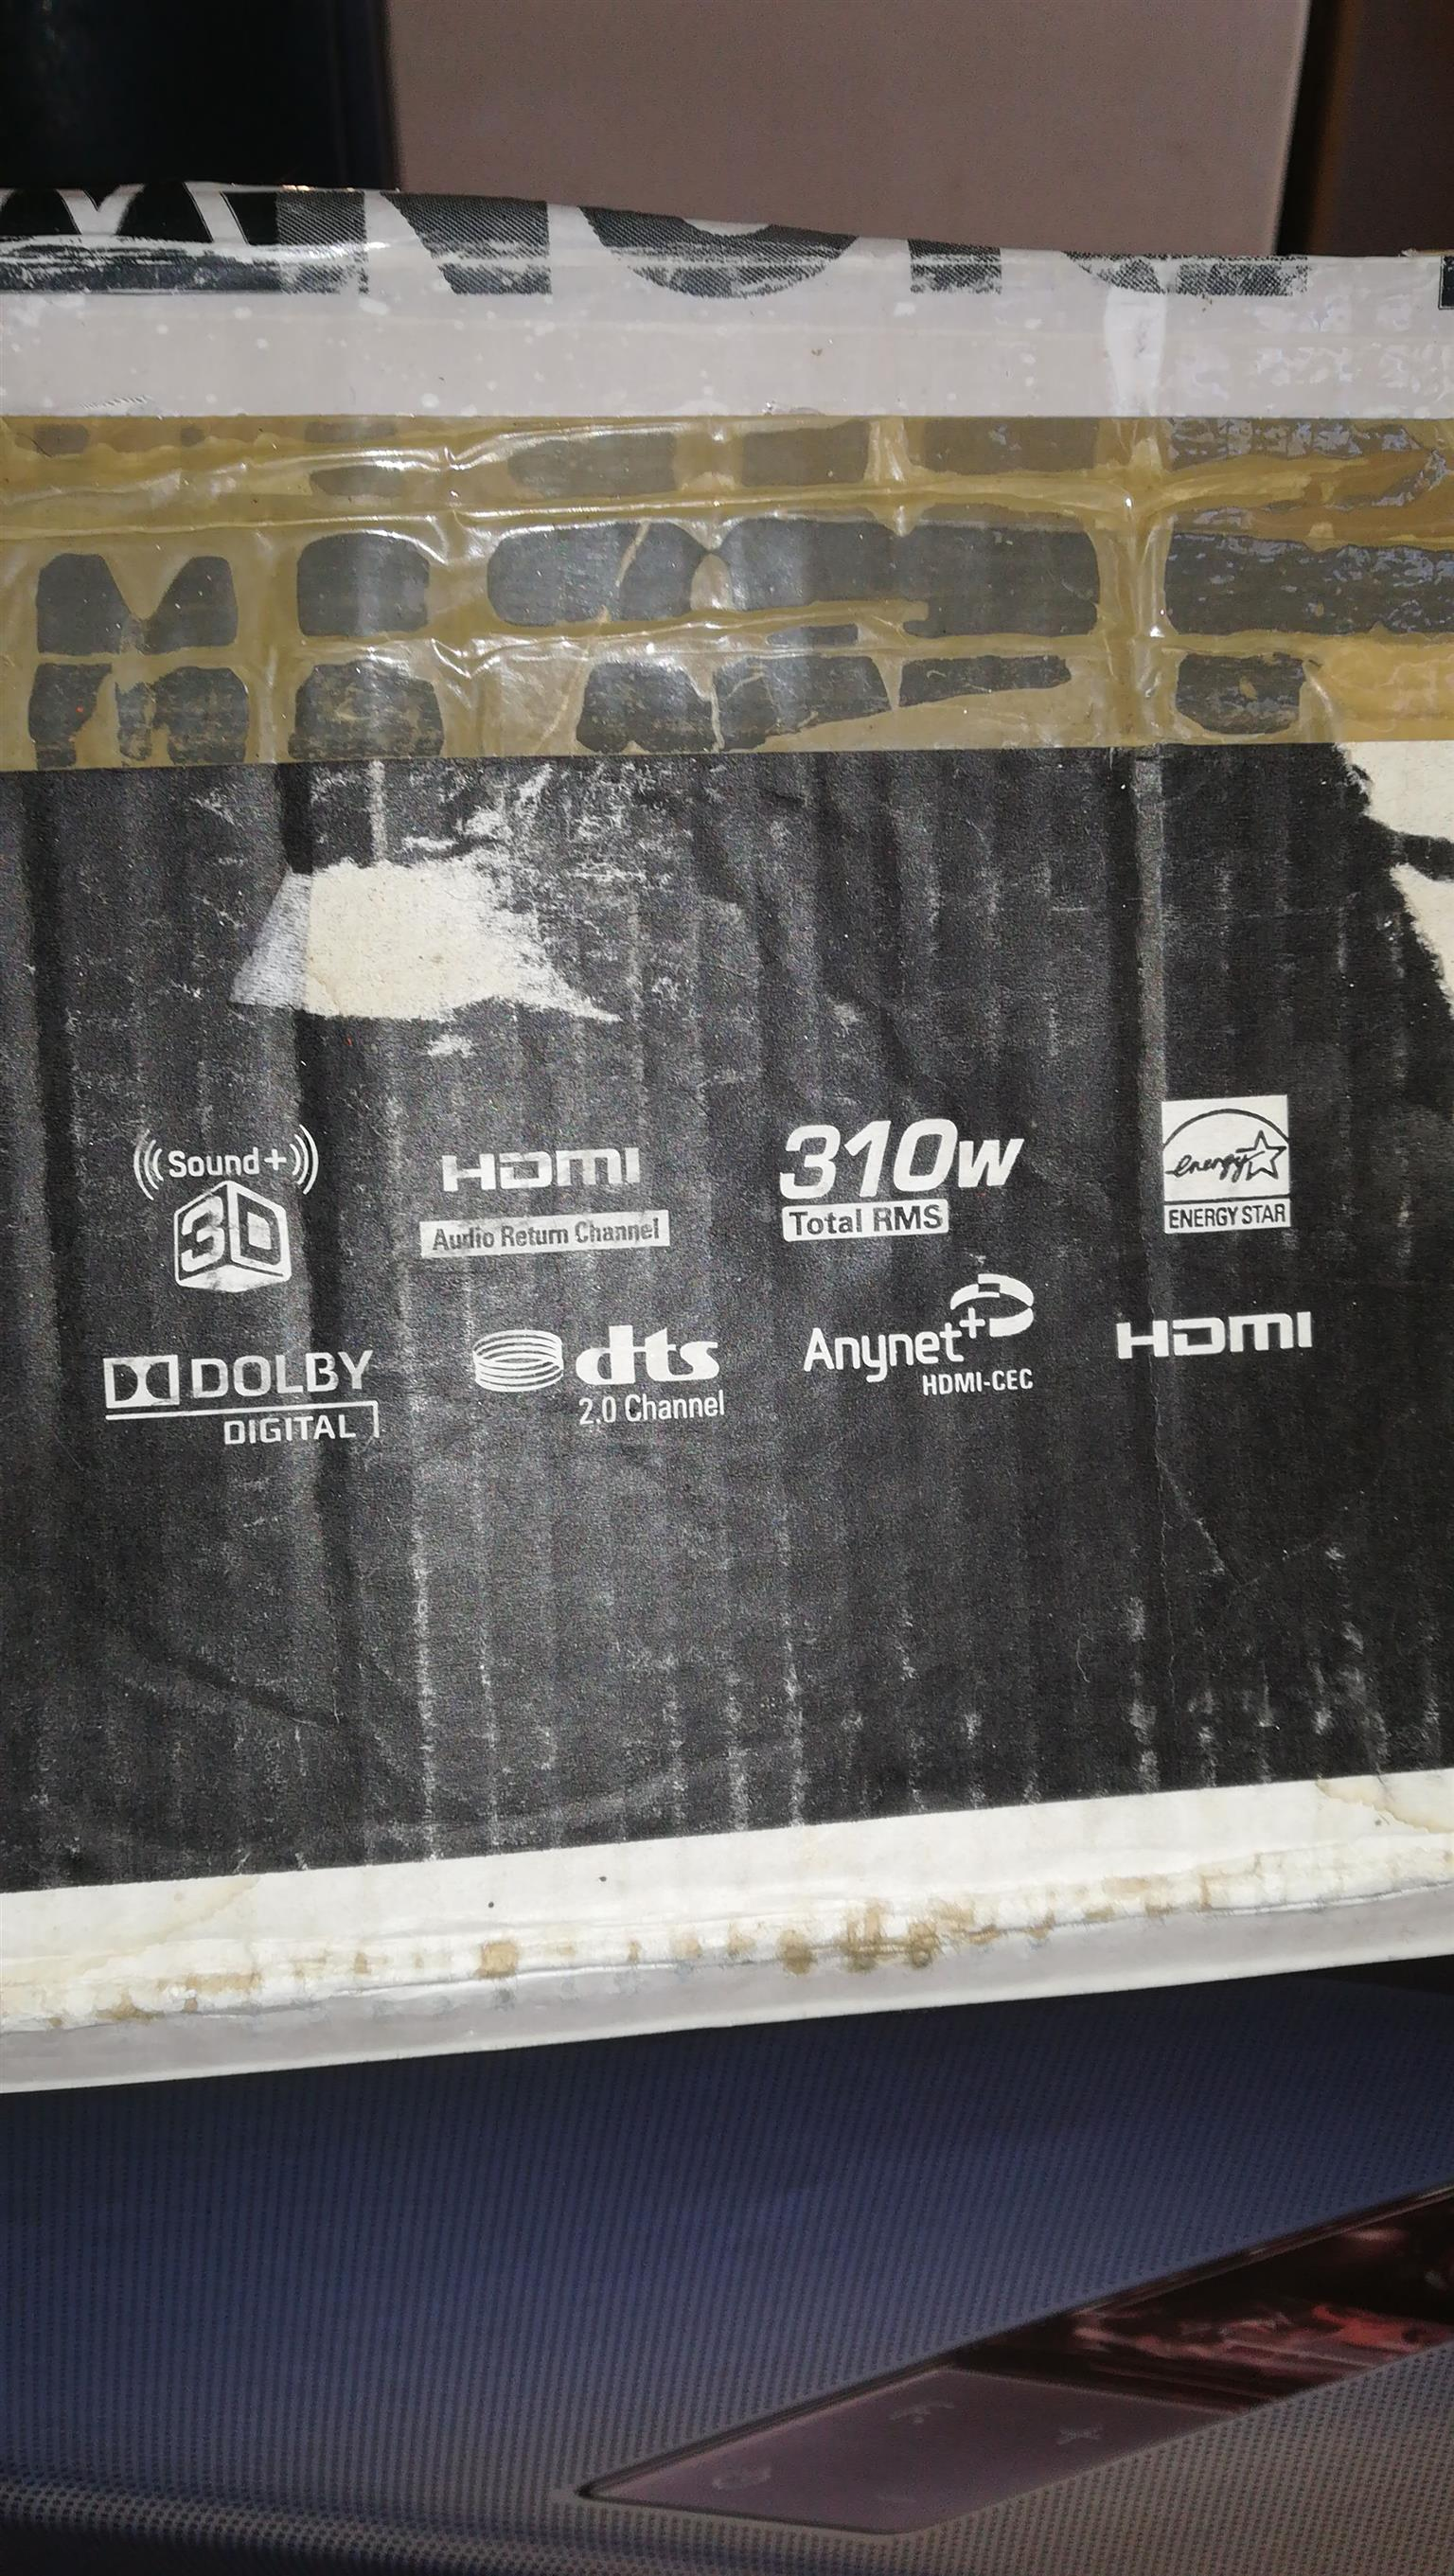 Samsung HW F751 sound bar 310 watts